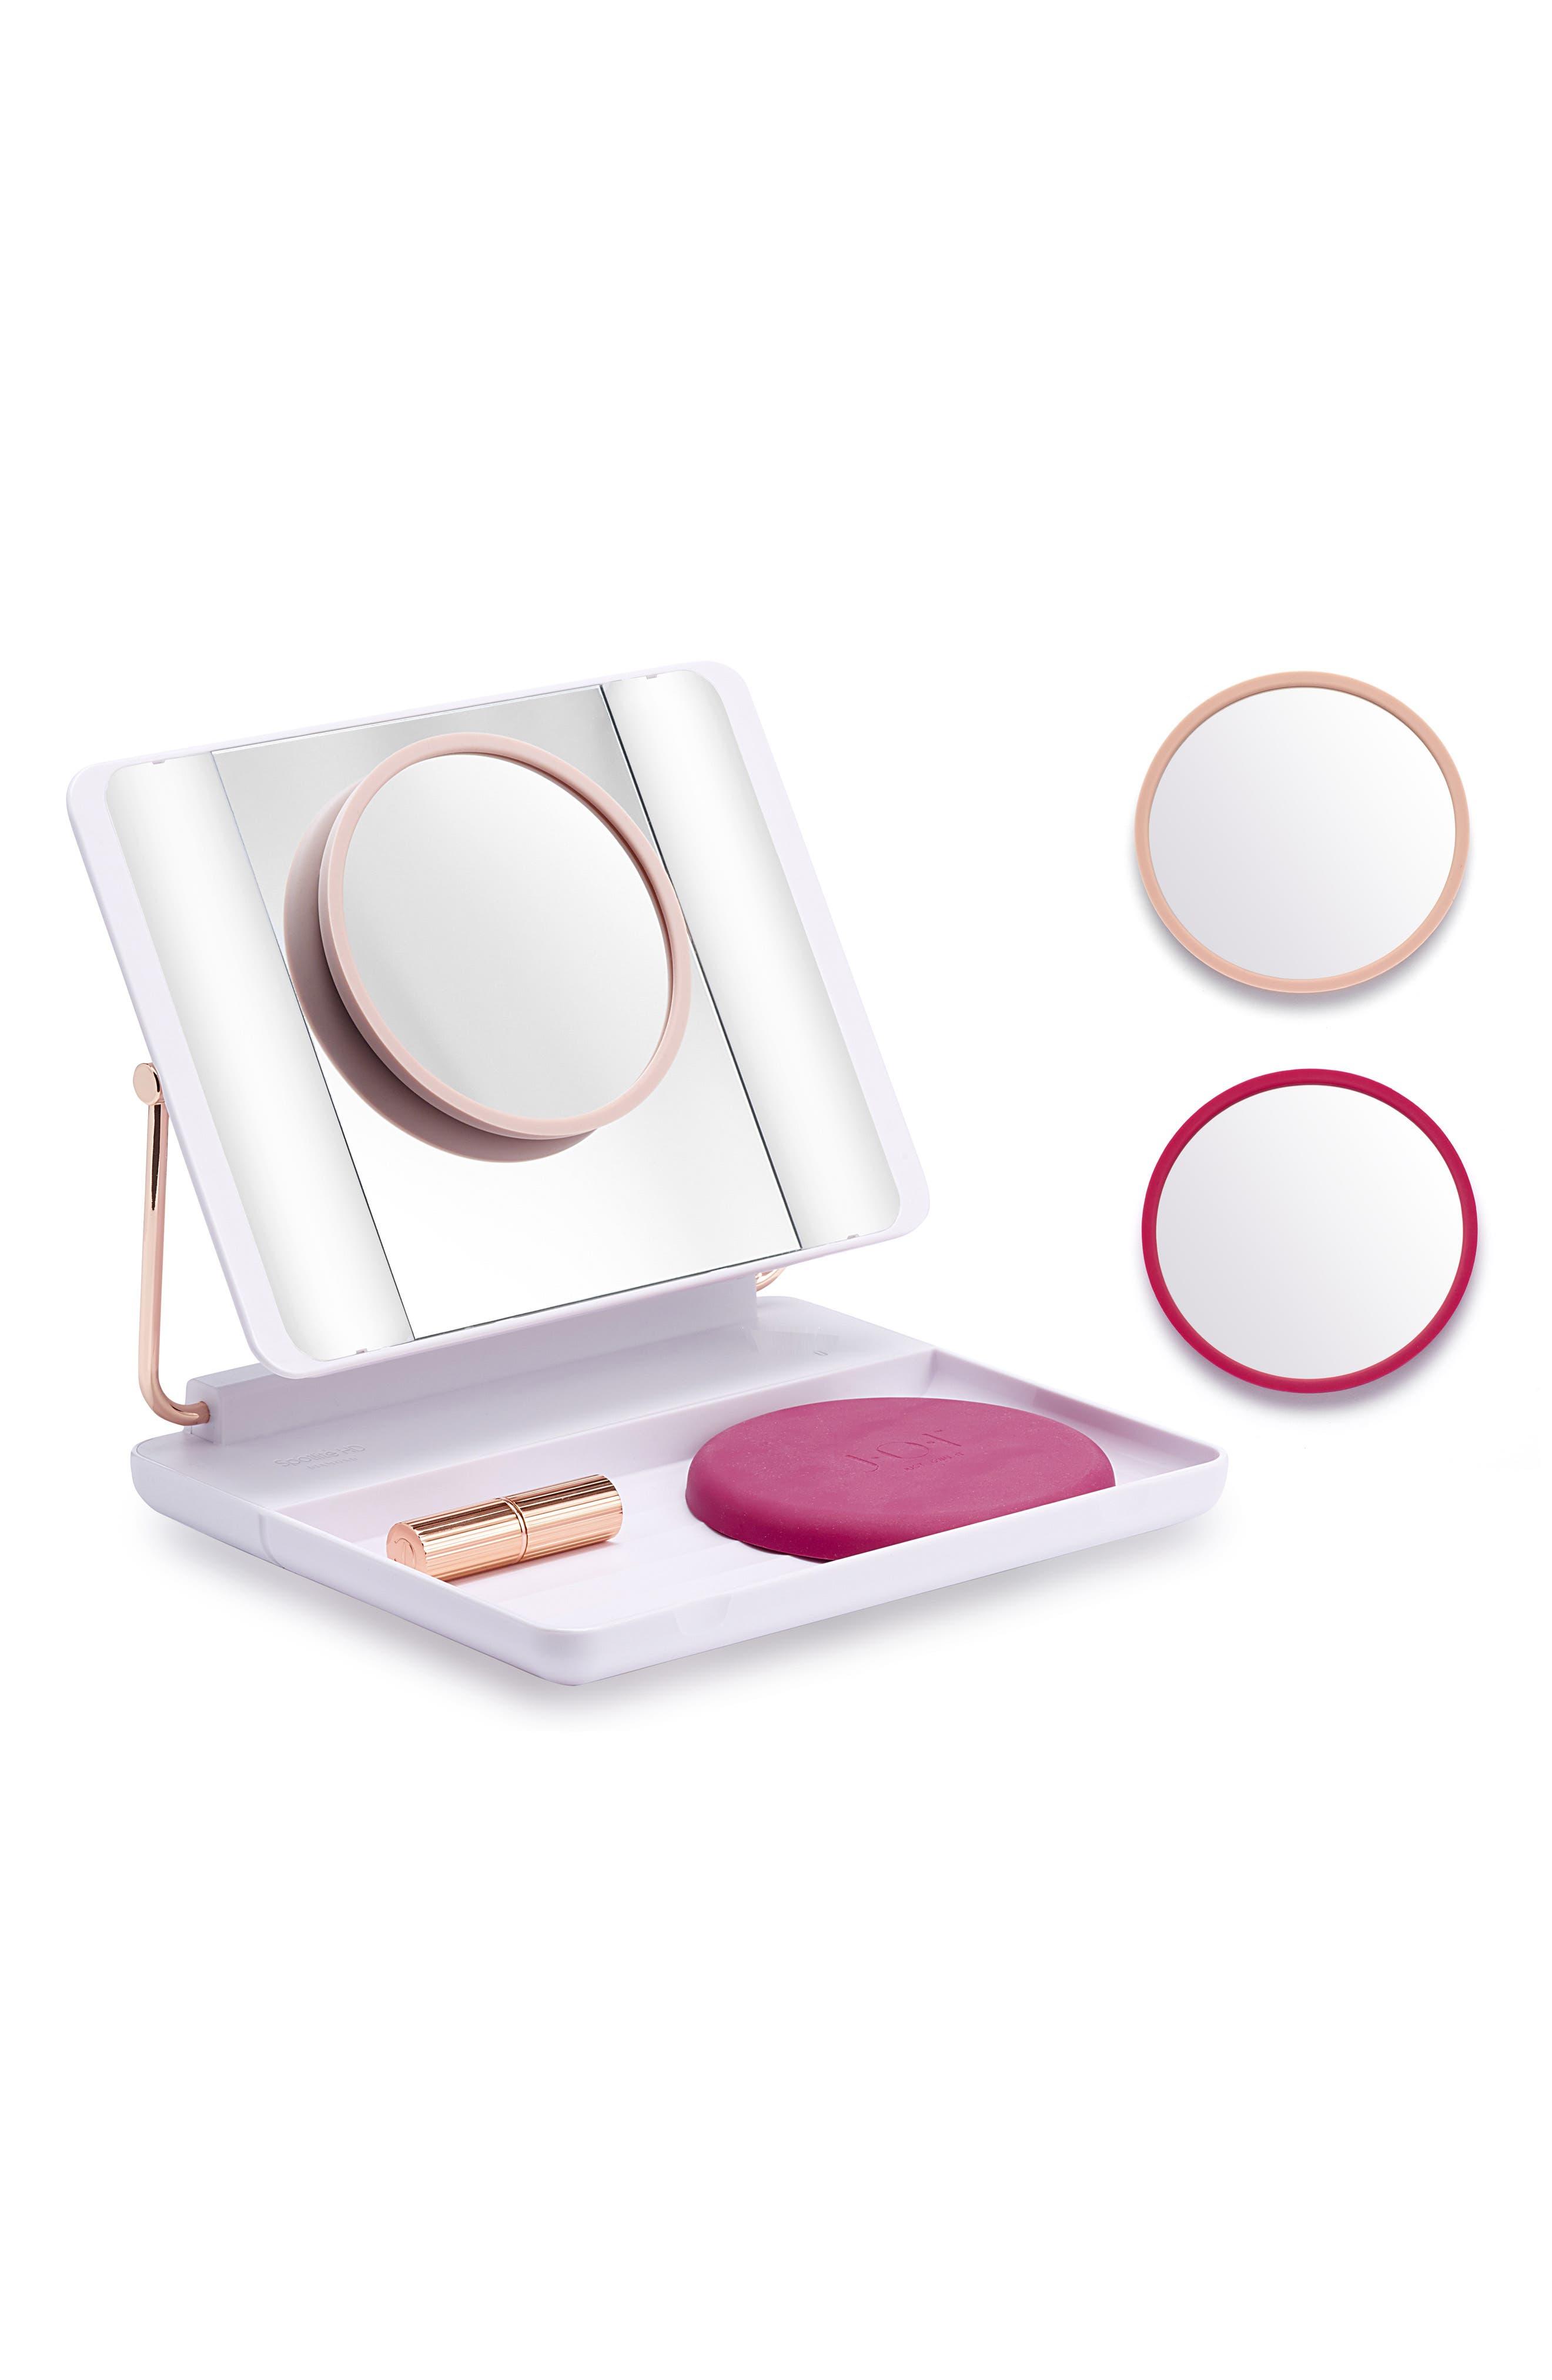 JOI Spotlite HD Diamond Makeup Mirror in Hot Blush, Main, color, 000